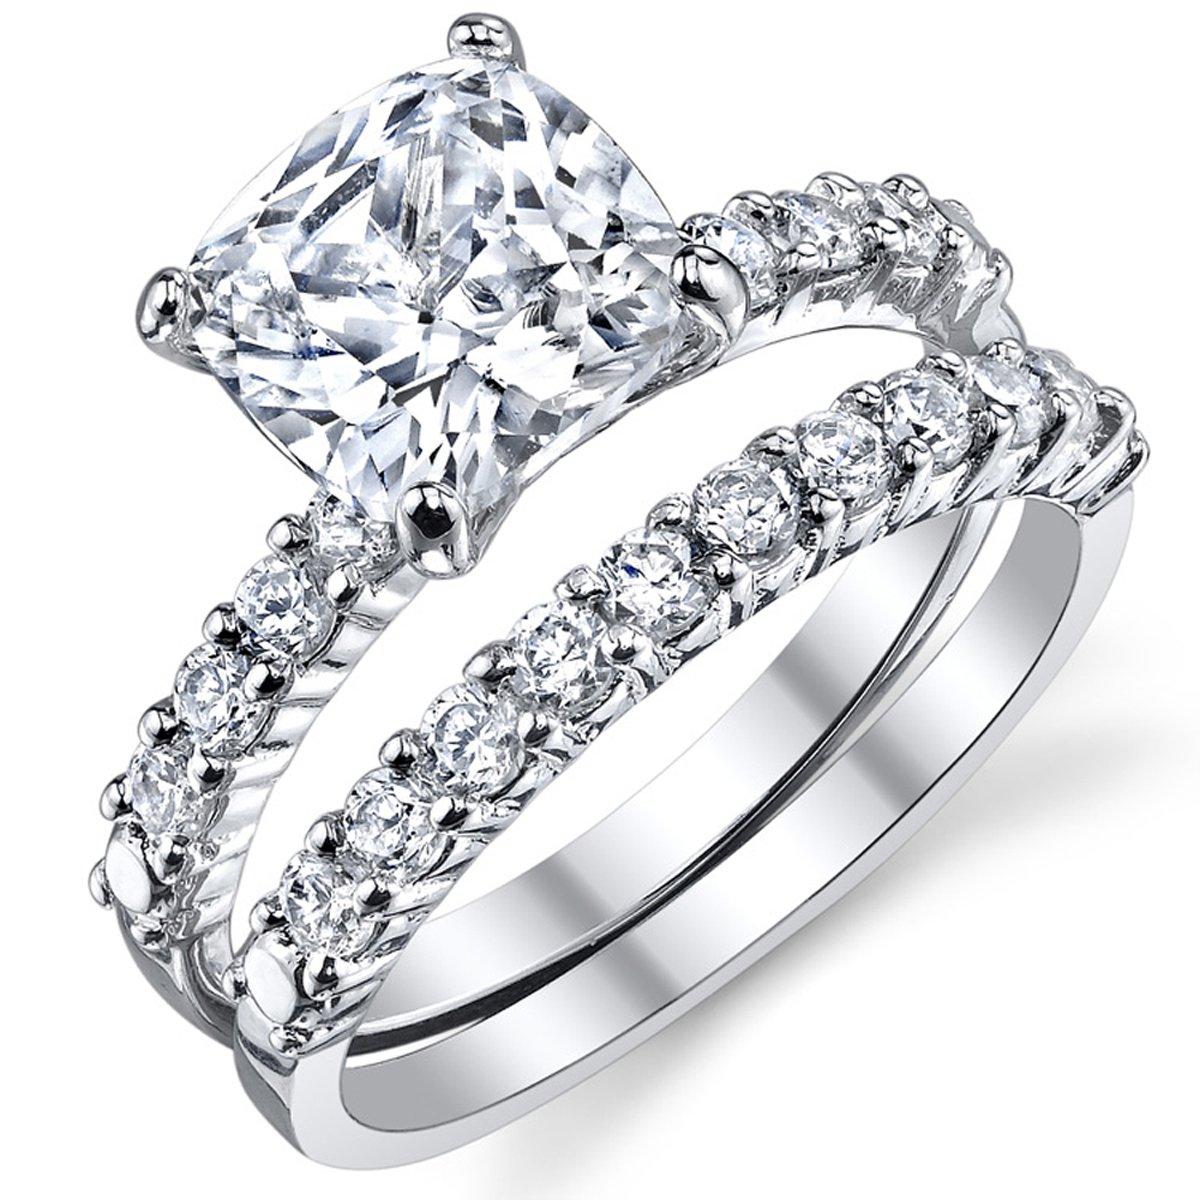 Fabulous Cushion Cut Cubic Zirconia Sterling Silver 925 Wedding Engagement Ring Band Set 9